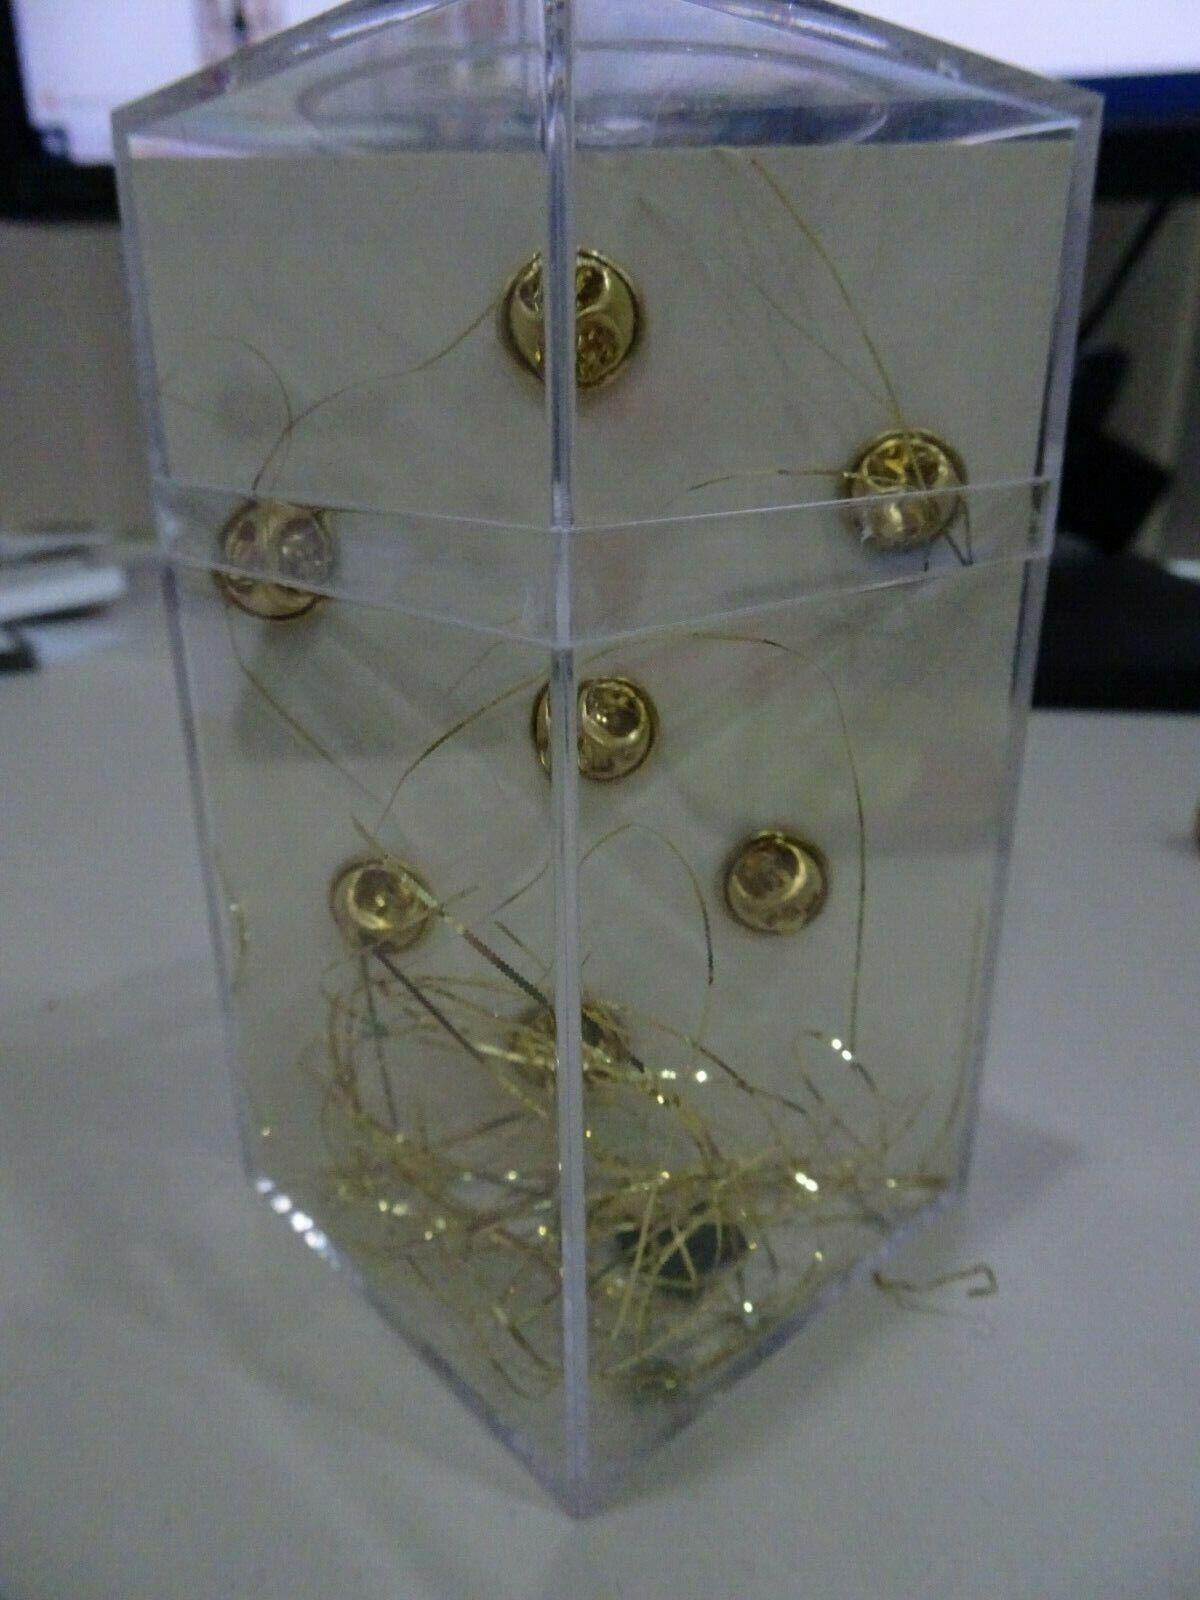 Hard Rock Cafe KEY WEST 2000 Millennium 4 PIN BOXED Set W/Card Champagne - $13.99